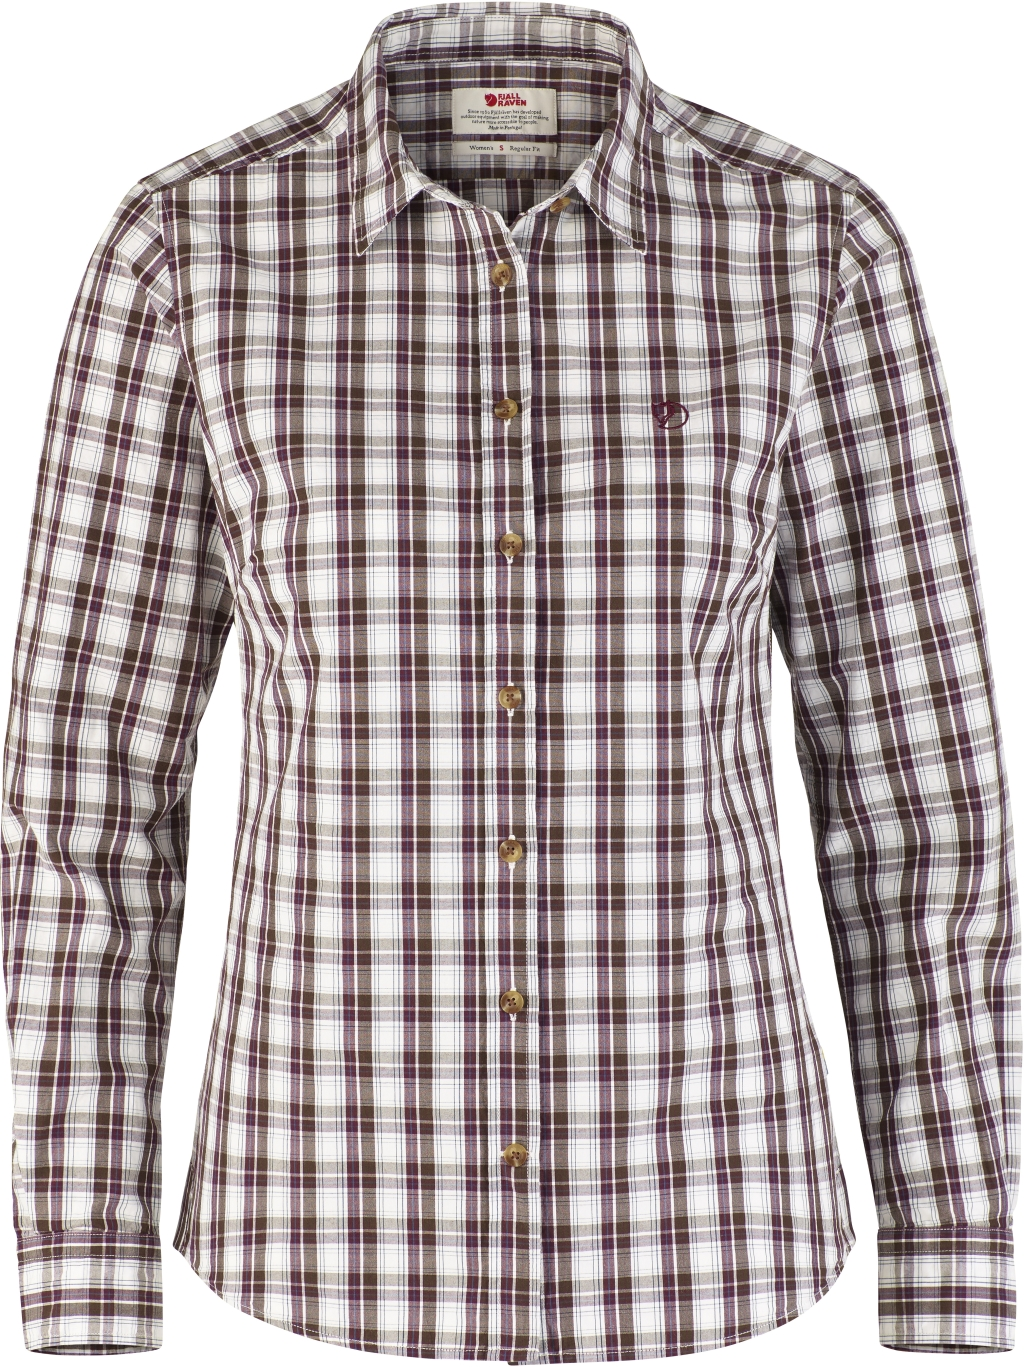 FjallRaven Sormland Shirt LS W Dark Garnet-30